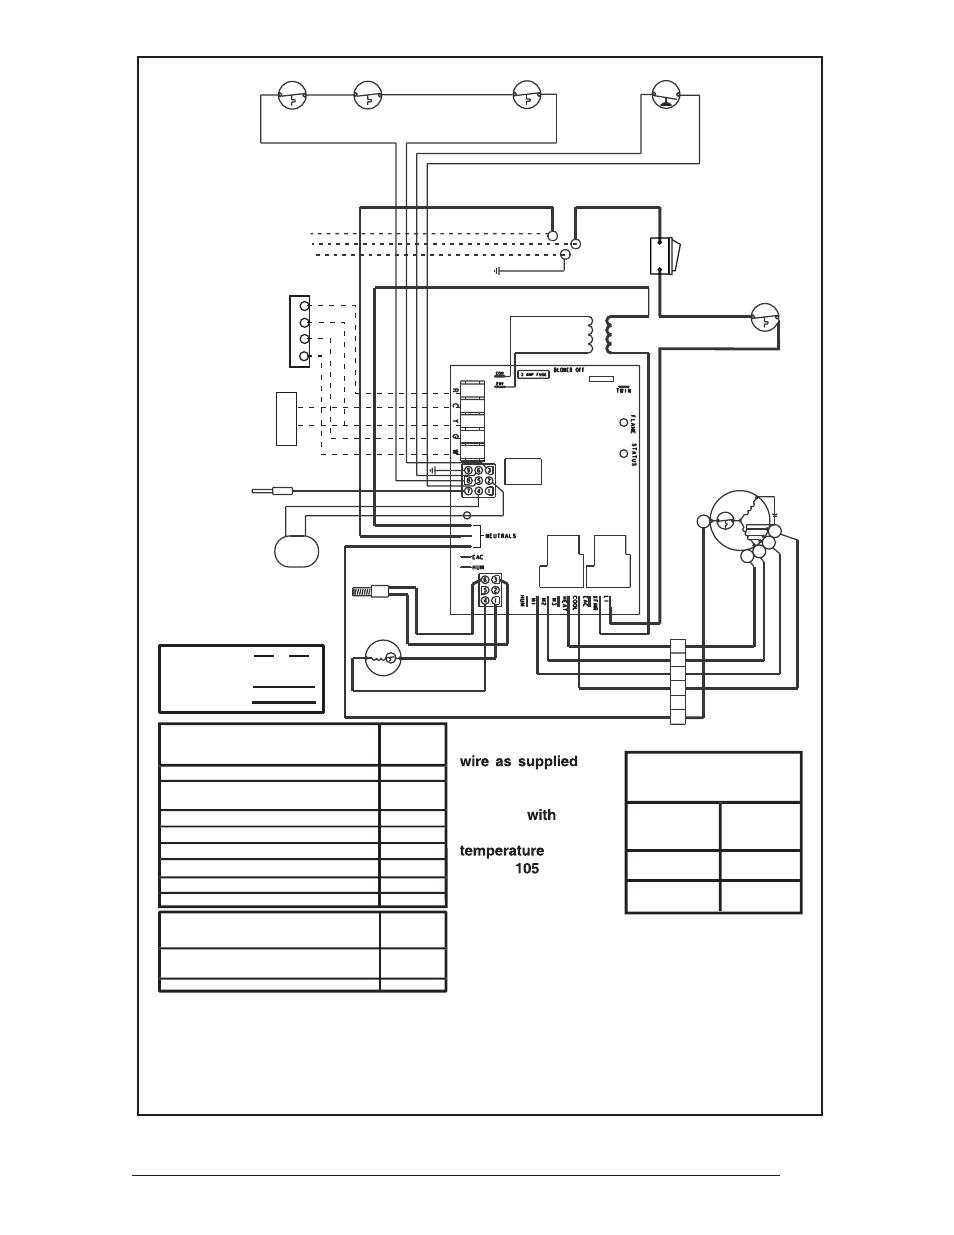 33 Figure 30  Downflow Furnace Wiring Diagram  Legend